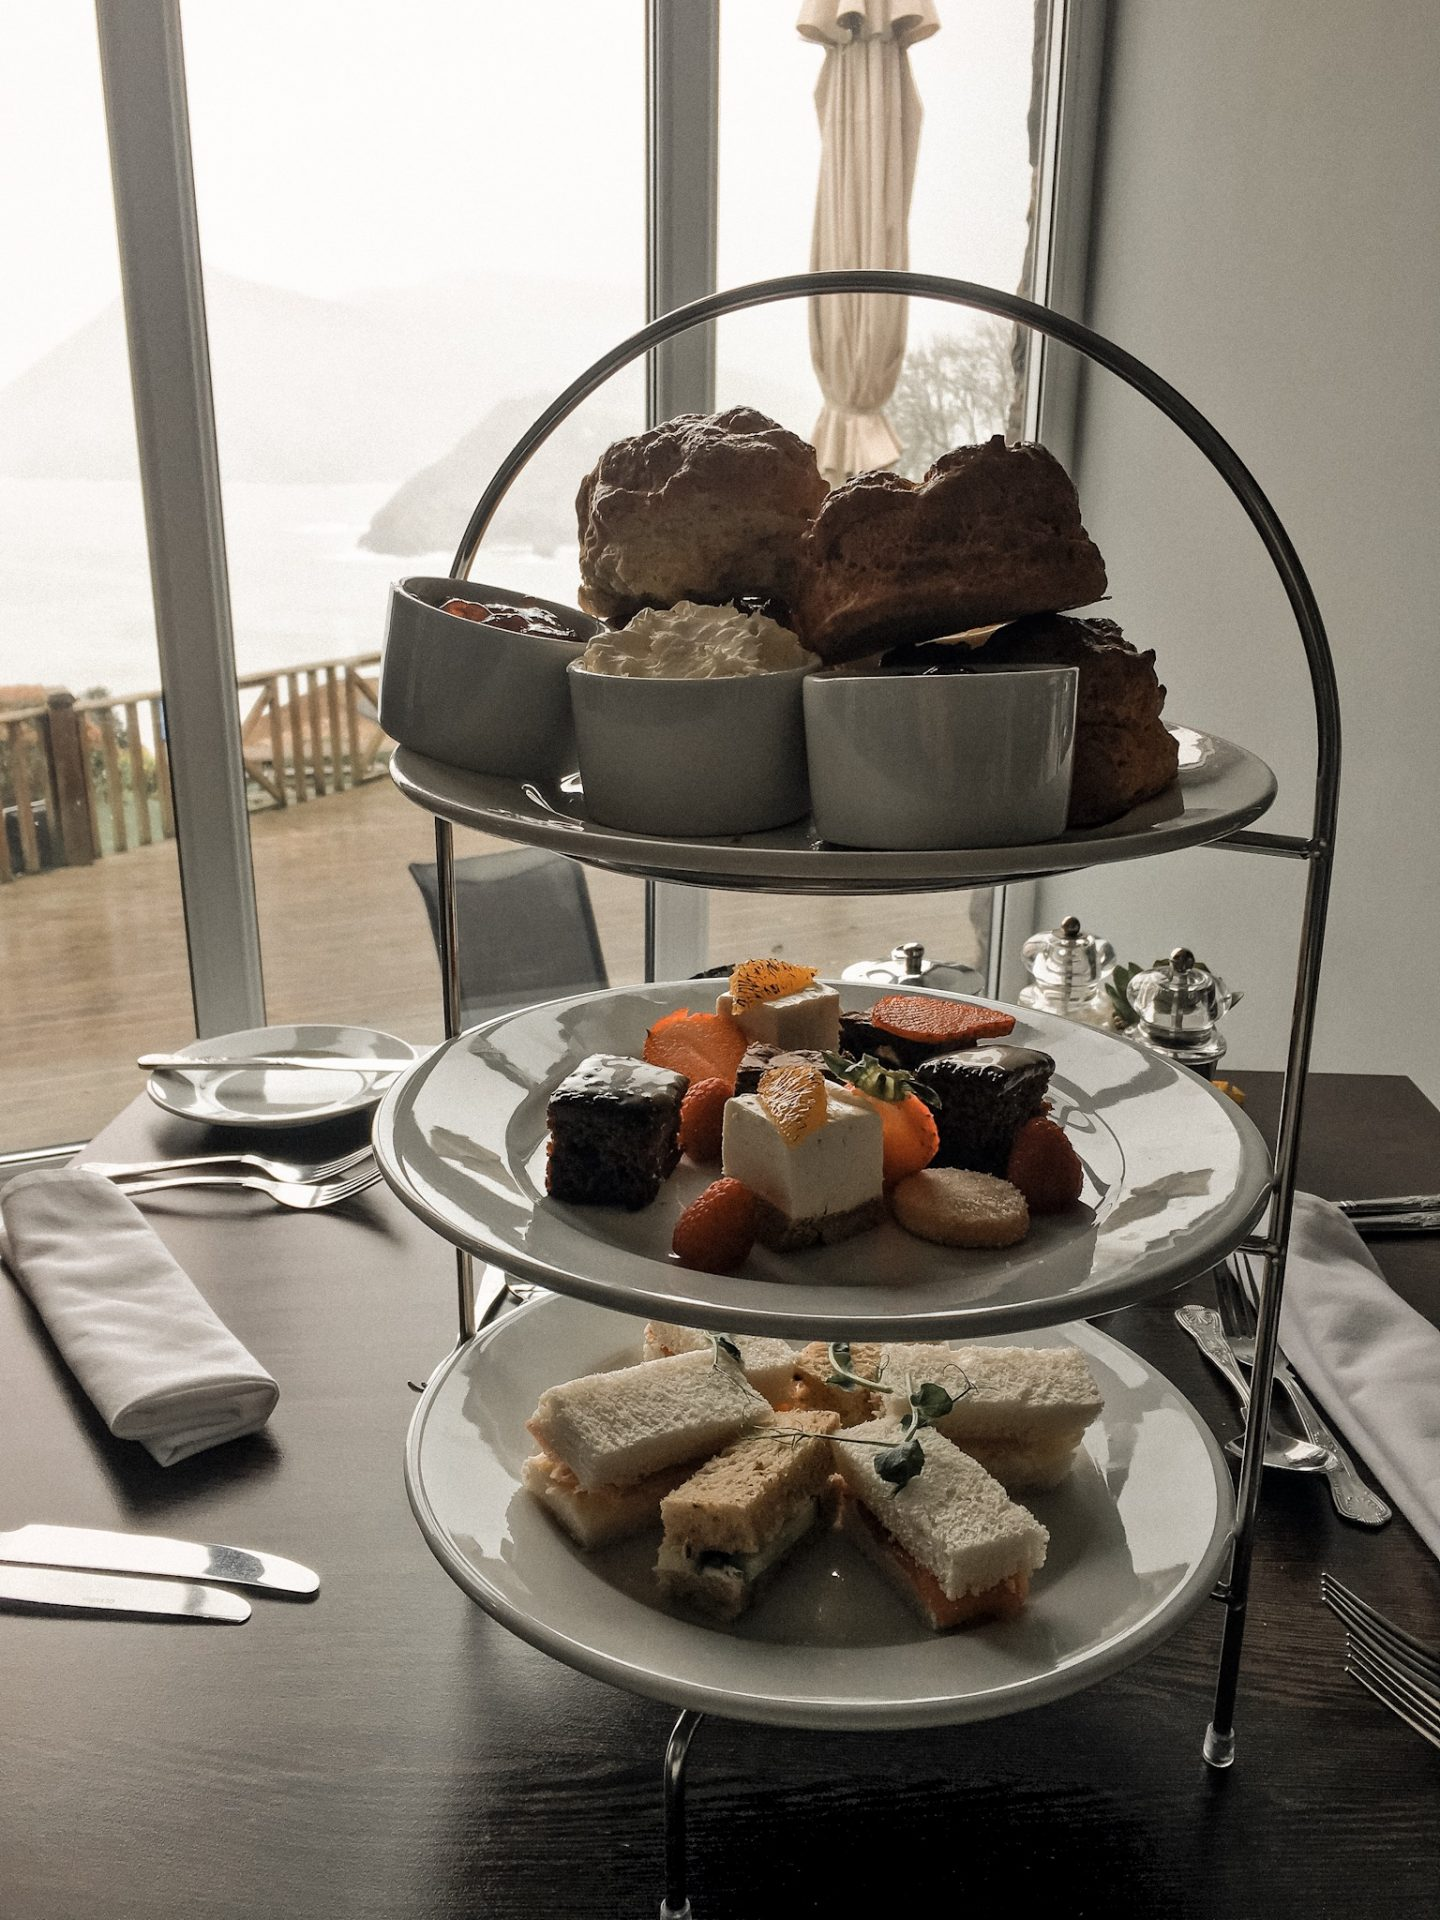 Sandy Cove Hotel Afternoon Teas in North Devon